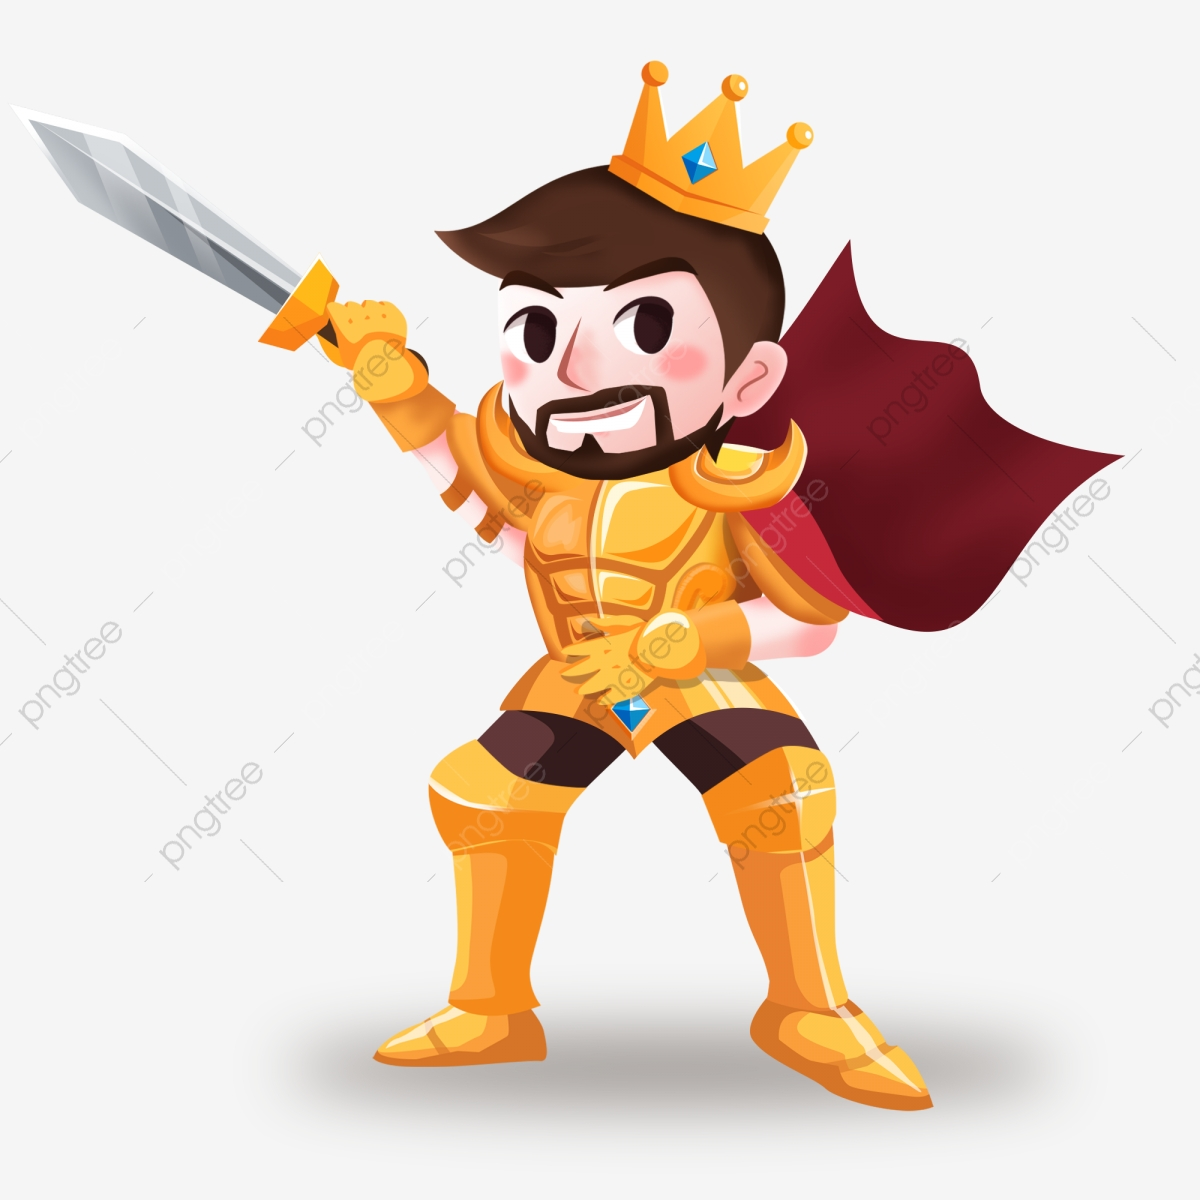 Cartoon armor holding sword. King clipart handsome